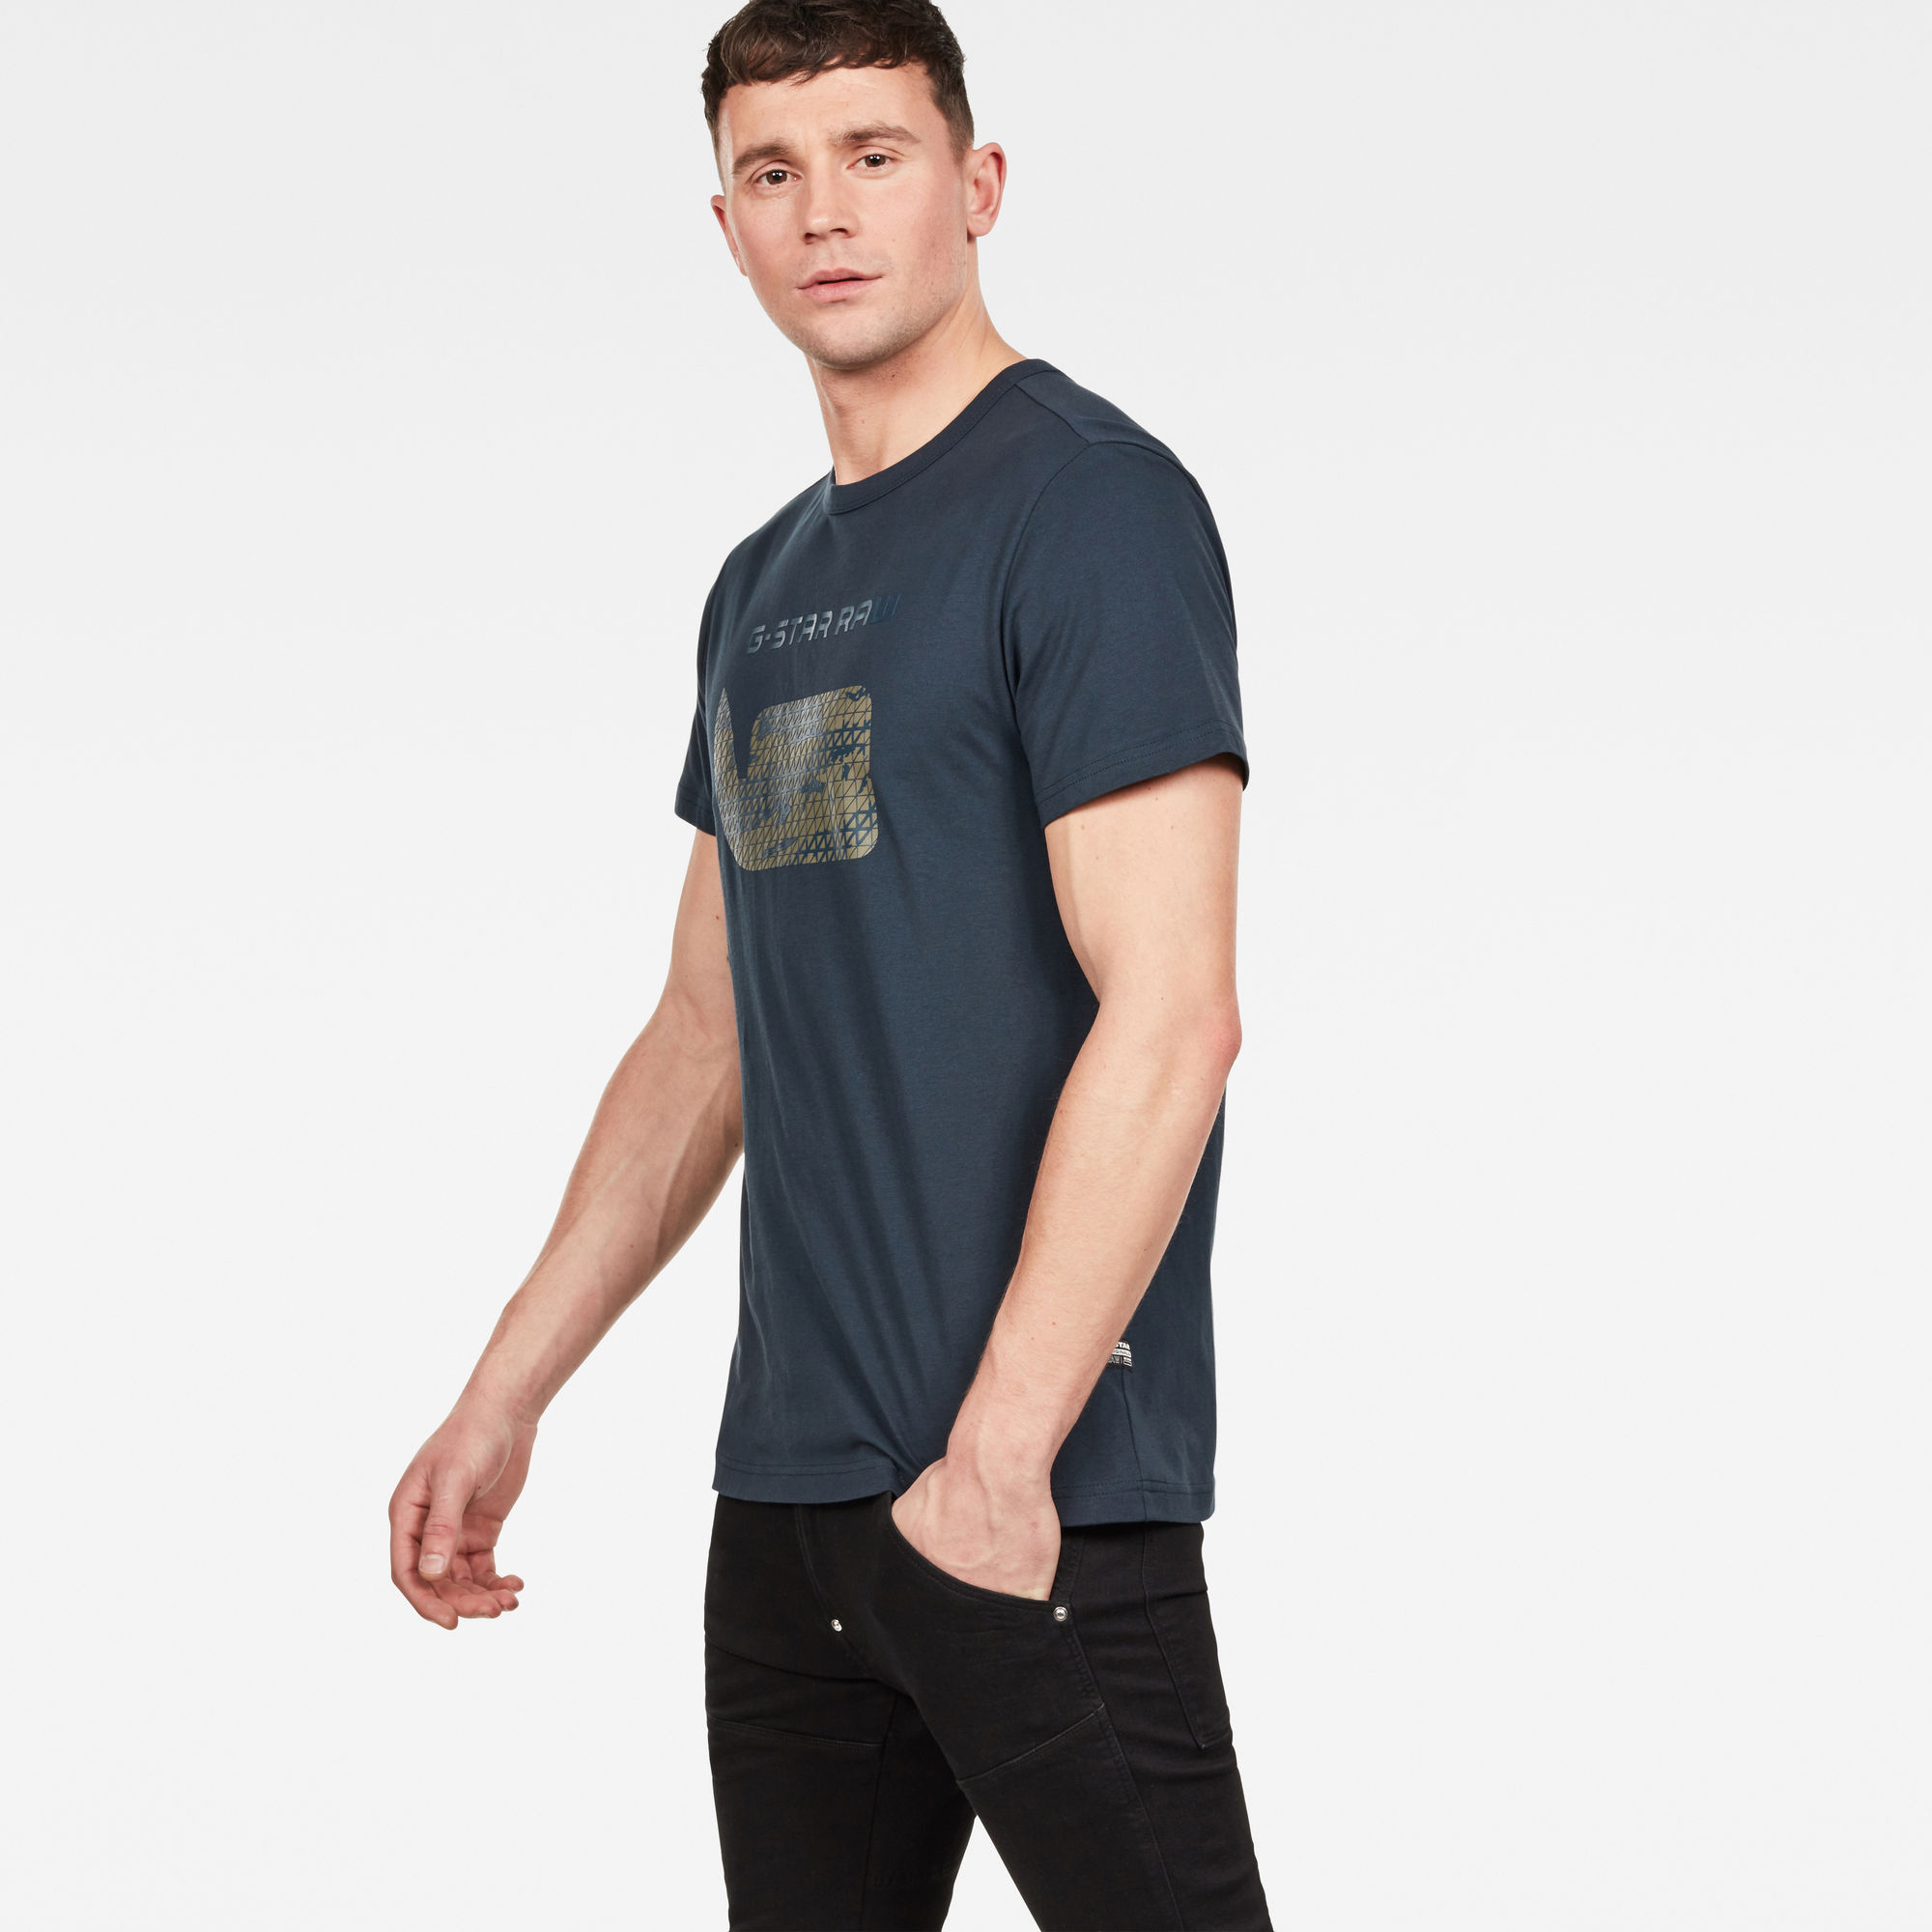 G-Star RAW Graphic 07 T-Shirt